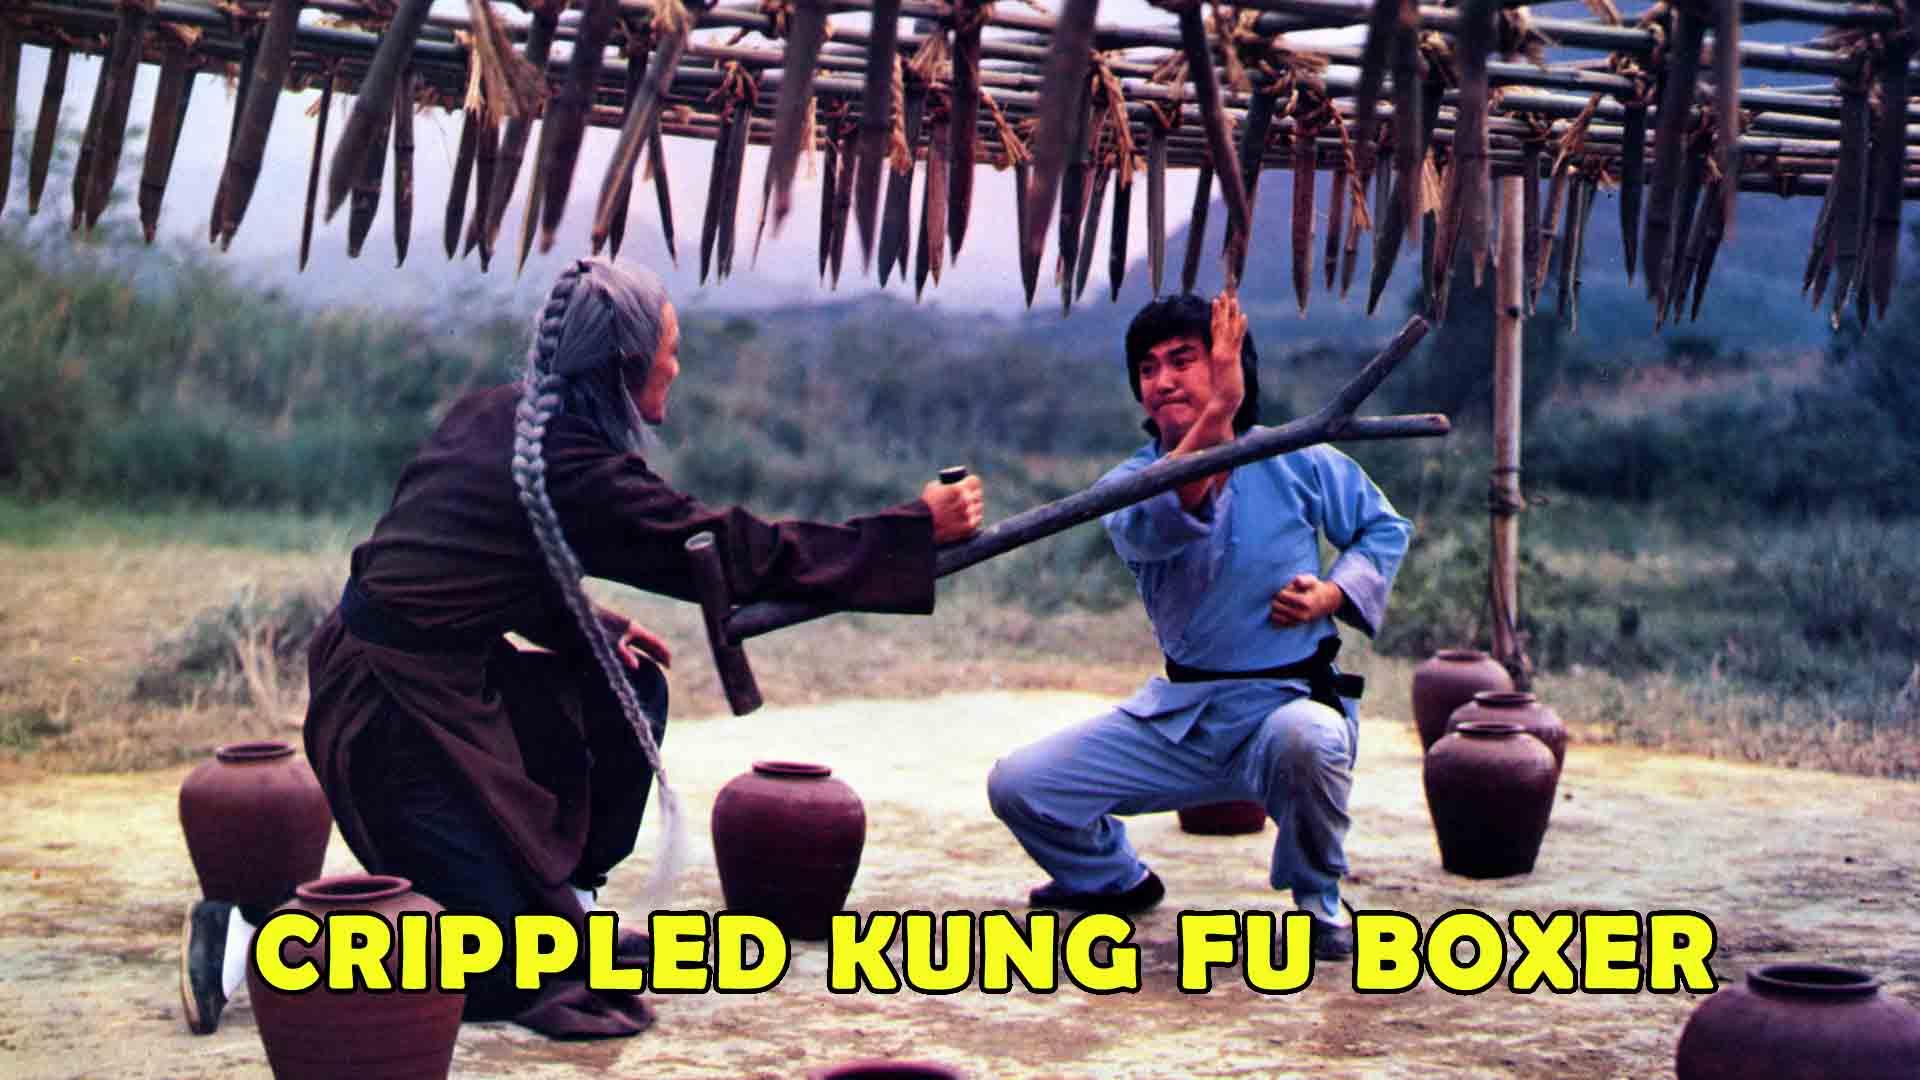 Crippled Kung Fu Boxer